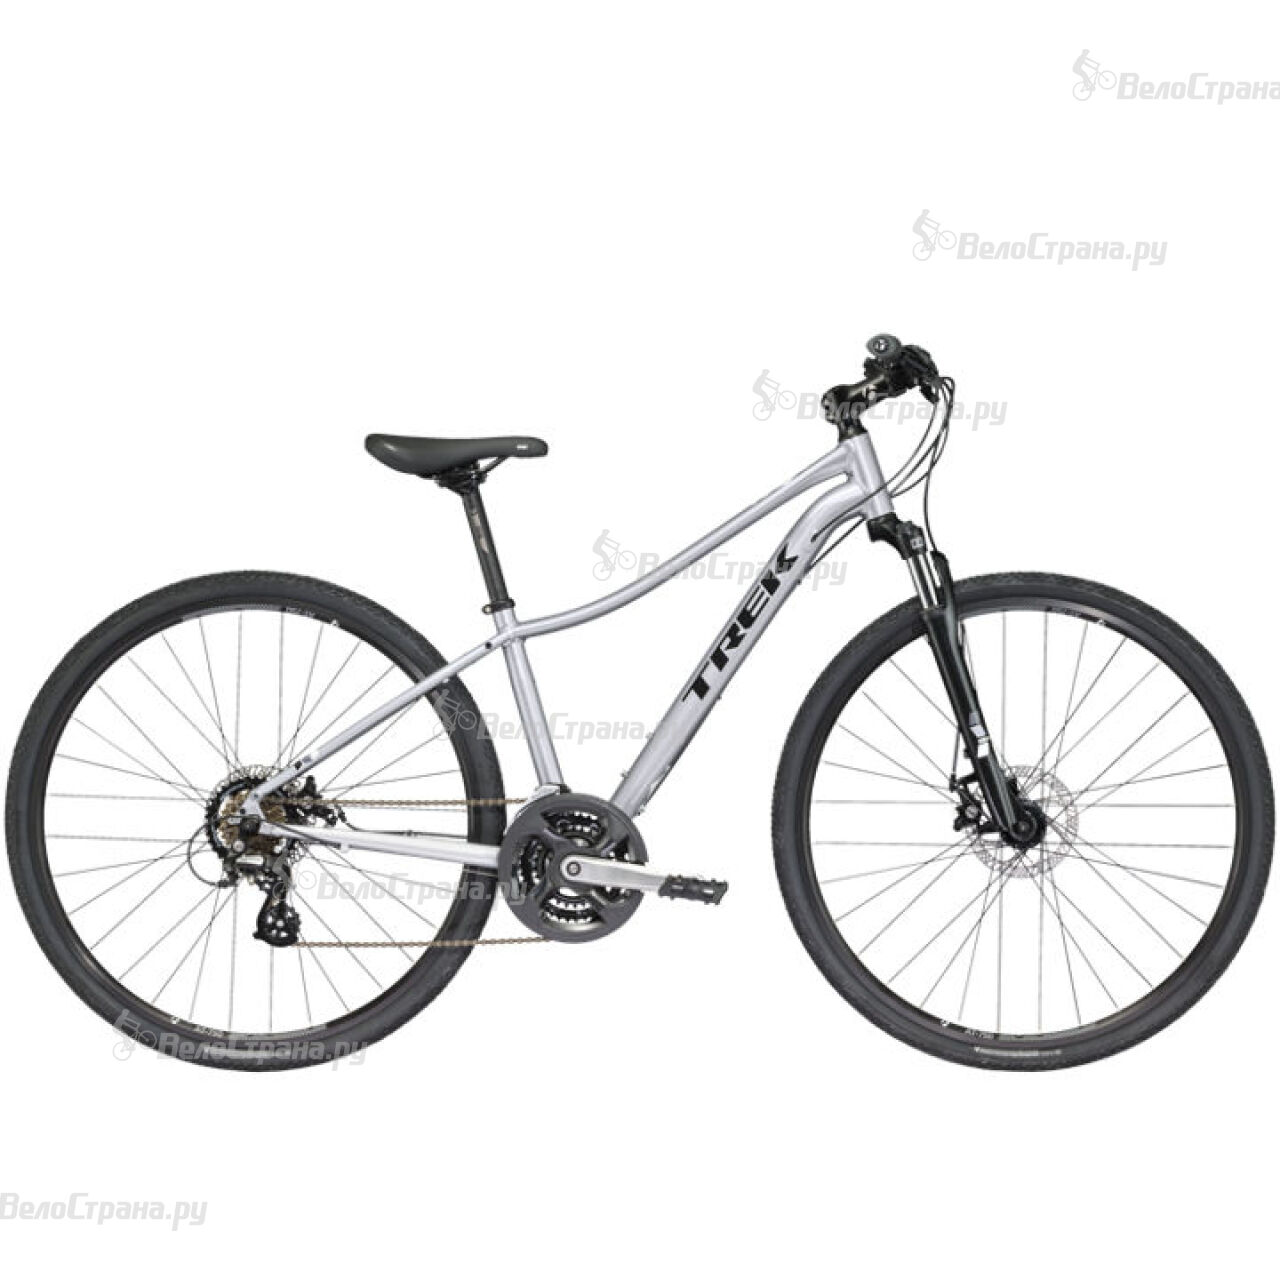 Велосипед Trek Neko 1 WSD (2017) велосипед trek neko 1 wsd 2018